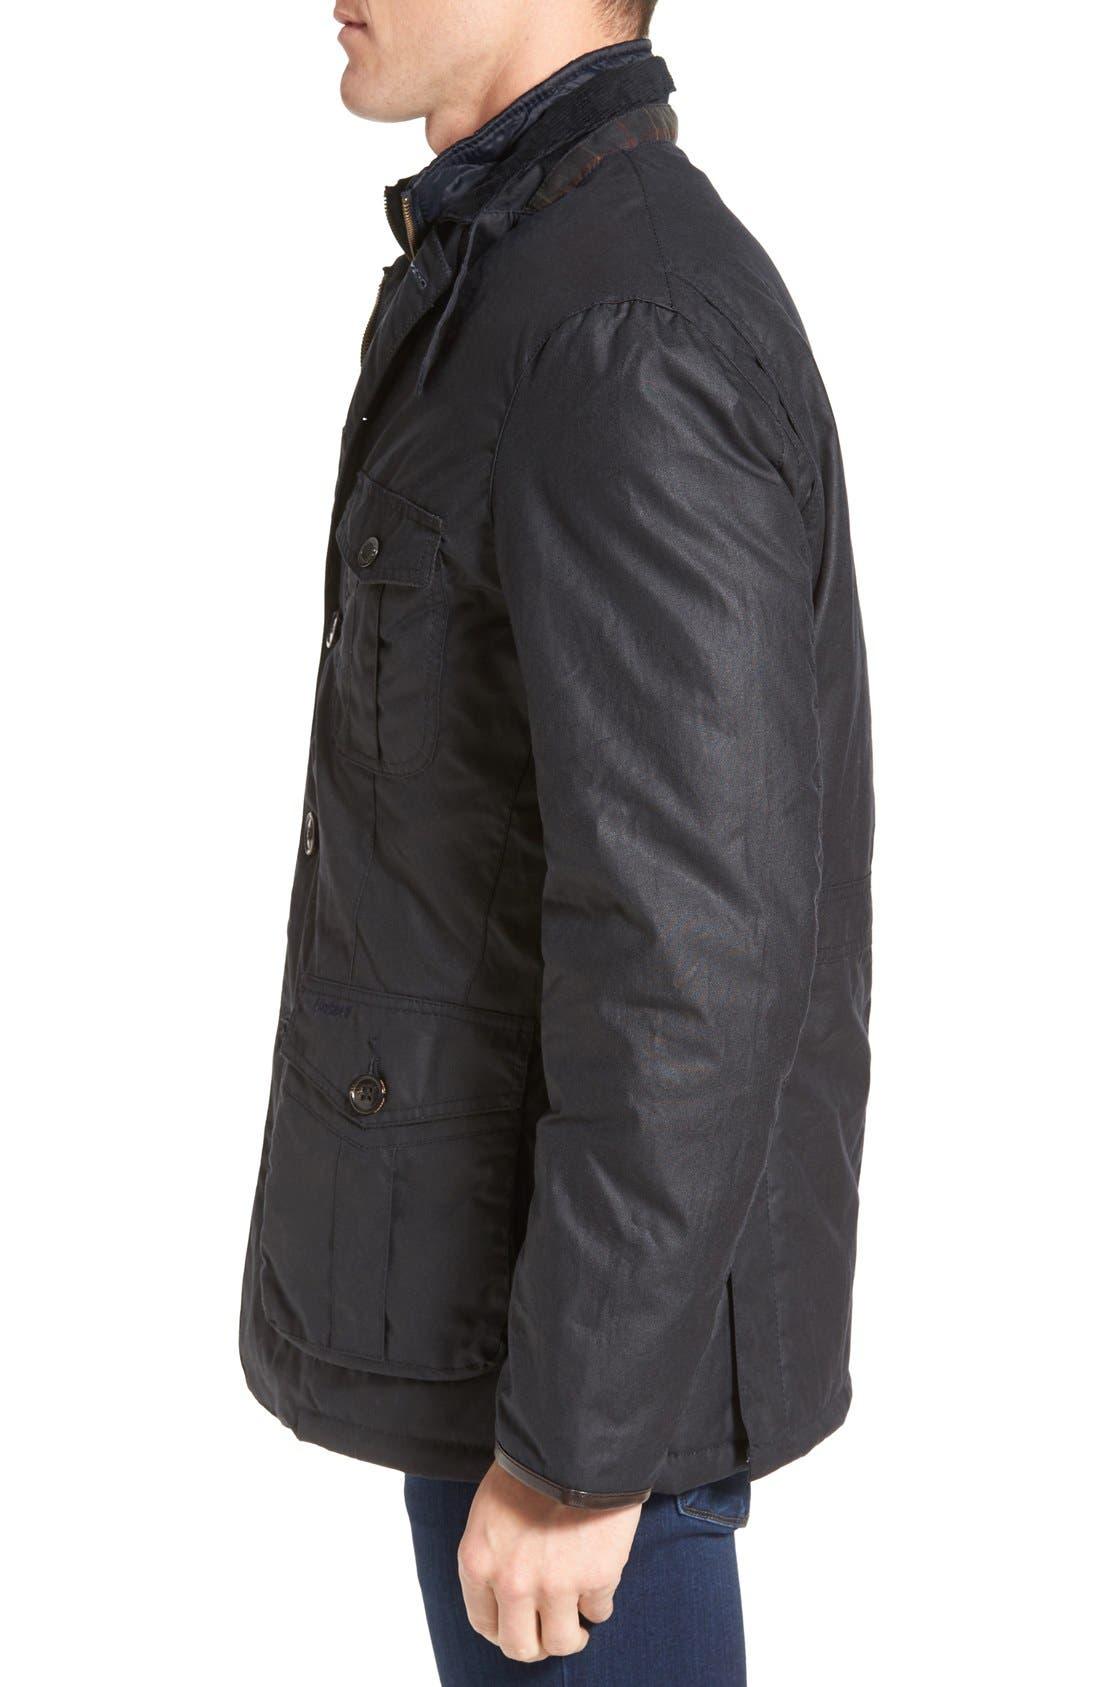 Torridon Wax Jacket with Bib,                             Alternate thumbnail 5, color,                             410